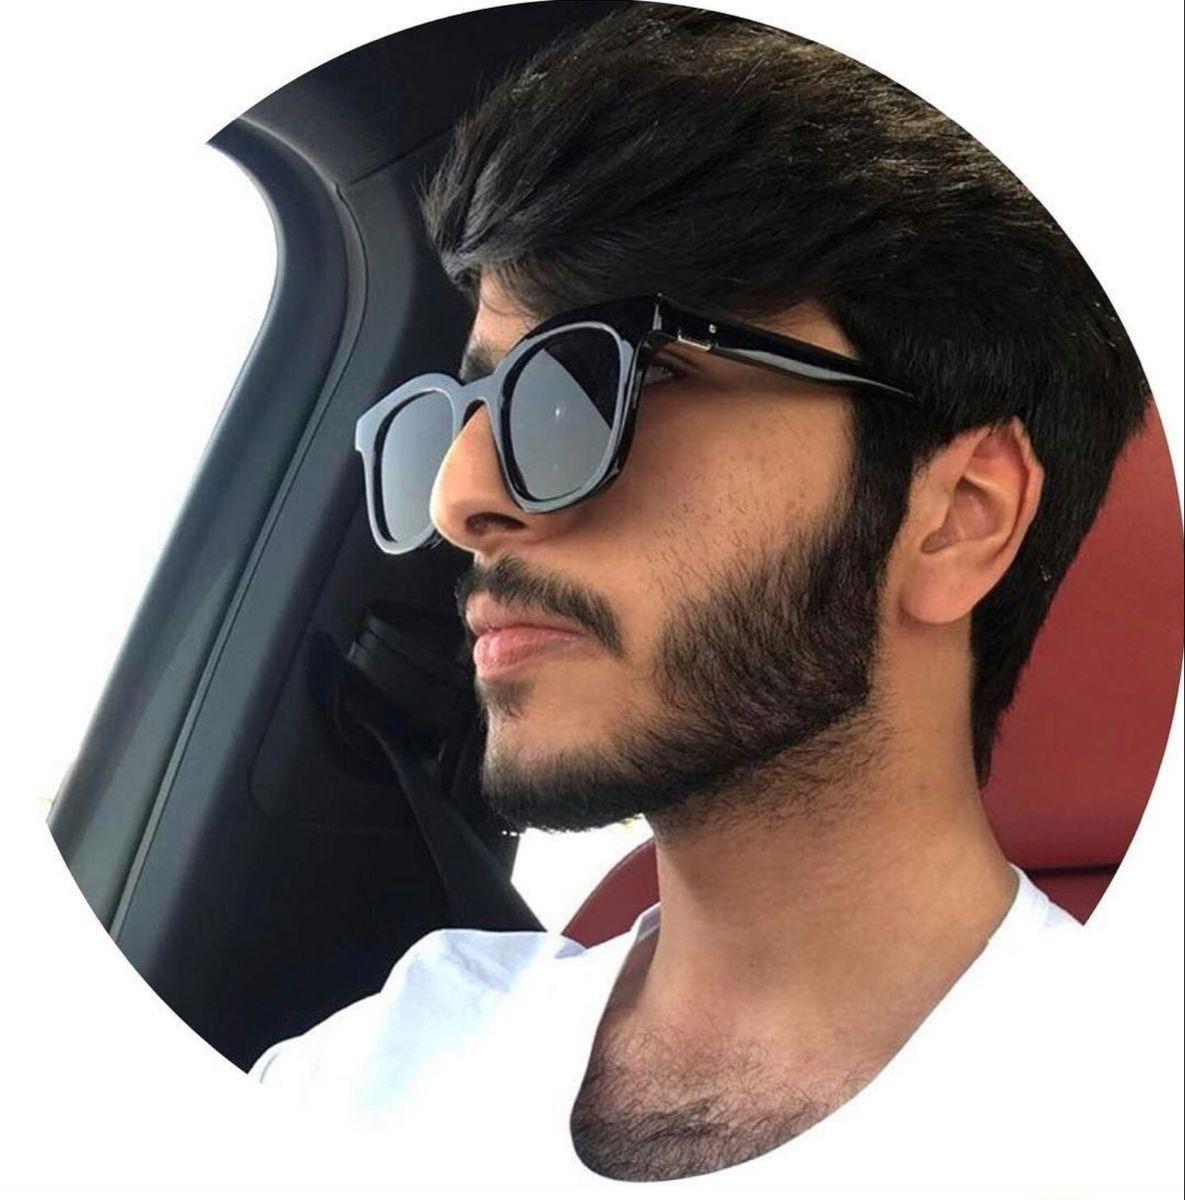 افتارات الاكسبلور Pinterest Photography Arab Men Dress Peaky Blinders Wallpaper